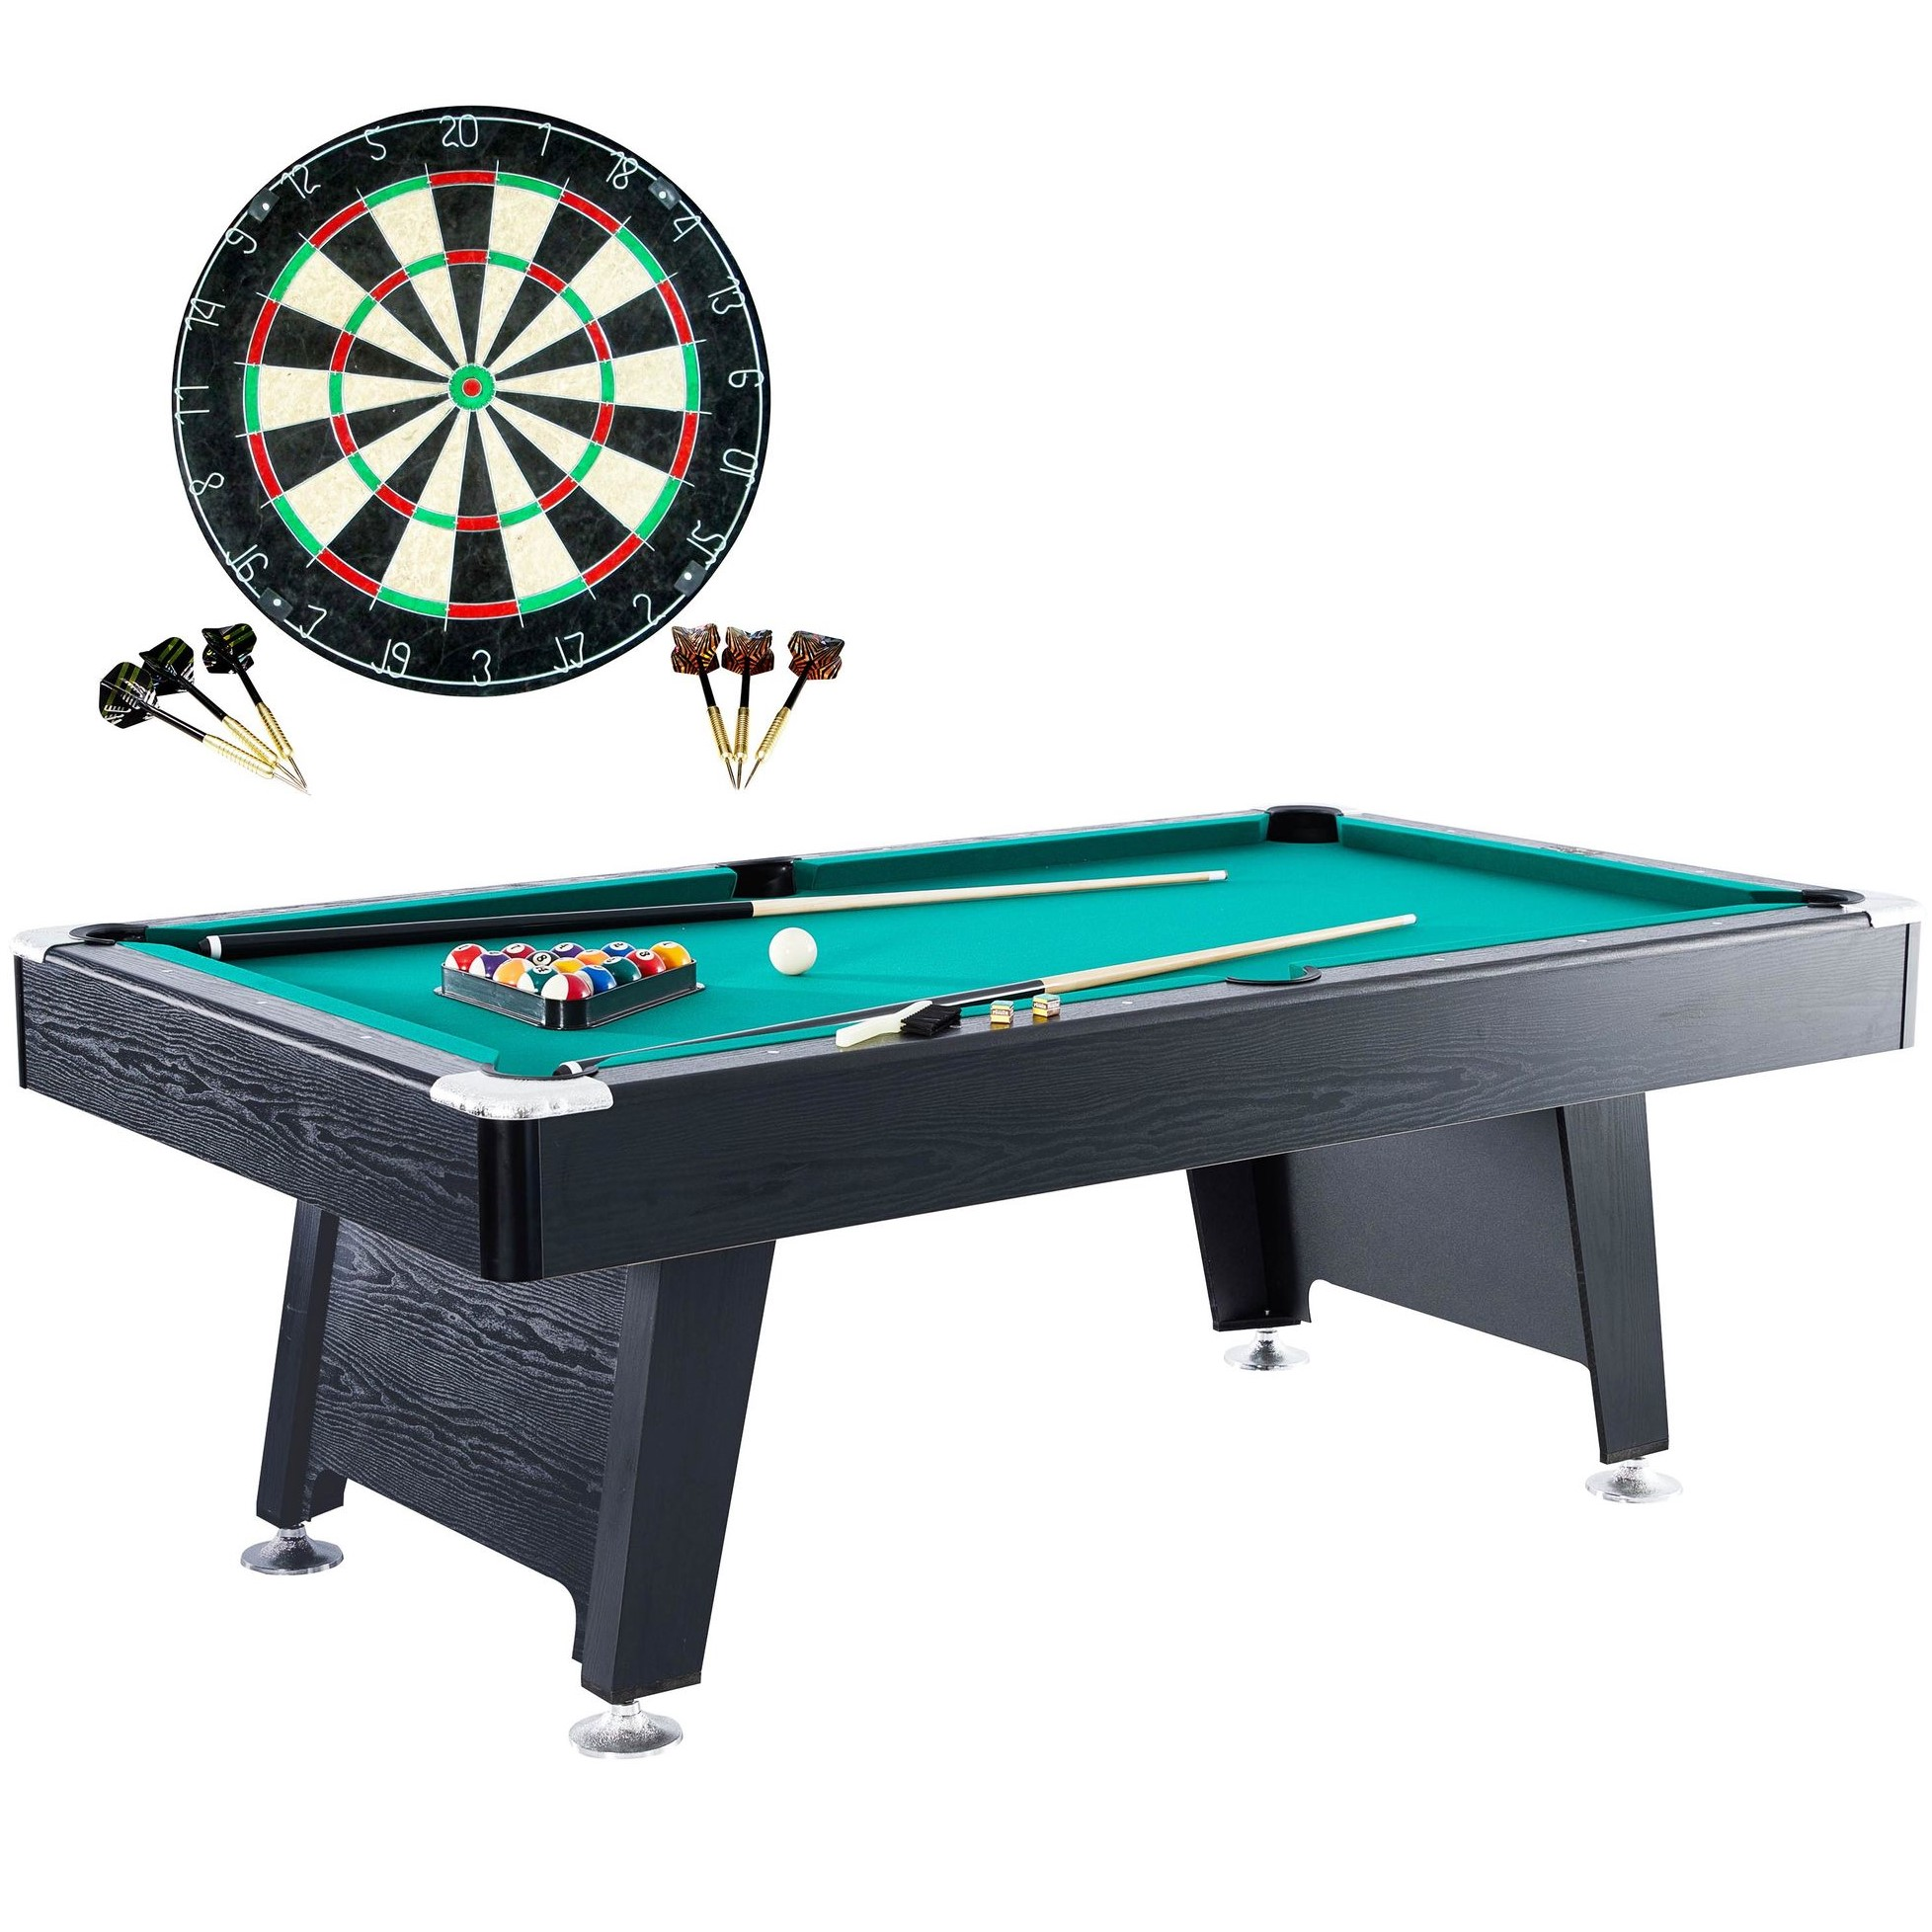 Barrington 84 Inch Arcade Billiard Table with Bonus Dartboard Set, Green Cloth